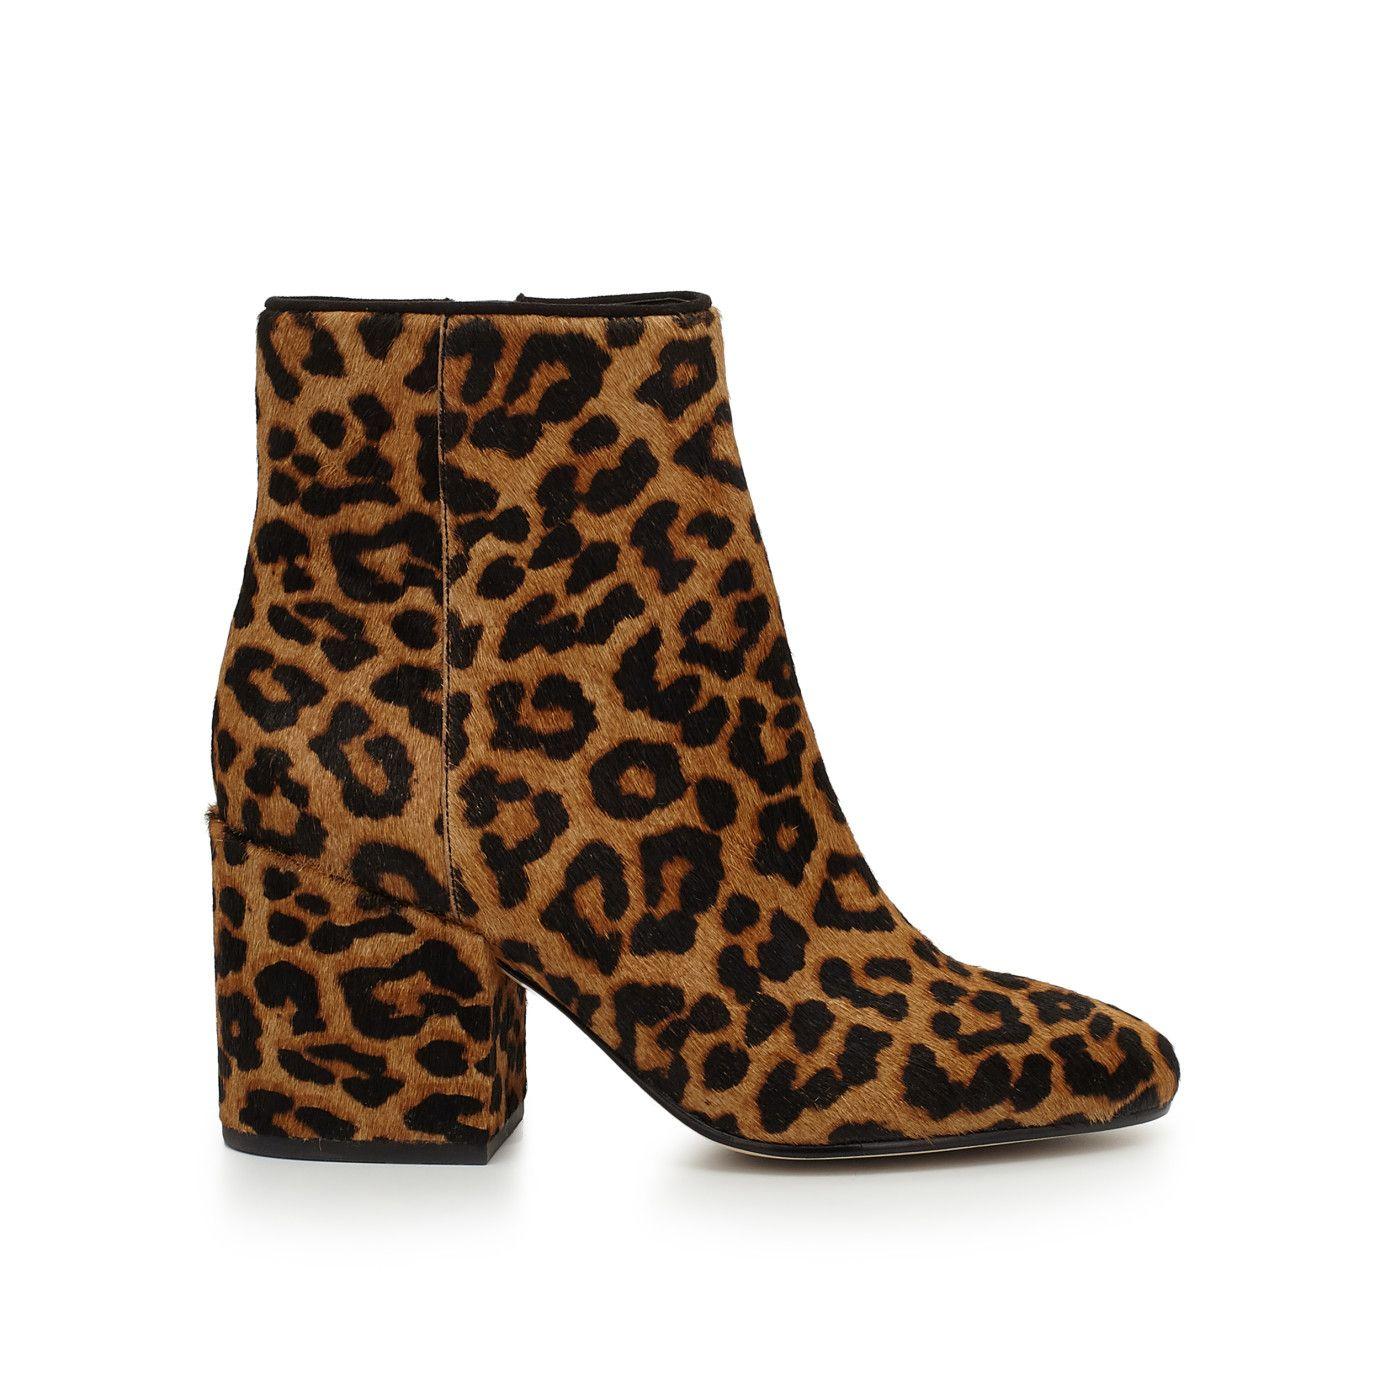 5ce33d2c3900df  180 Taye Heeled Ankle Bootie by Sam Edelman - Leopard Brahma - View ...